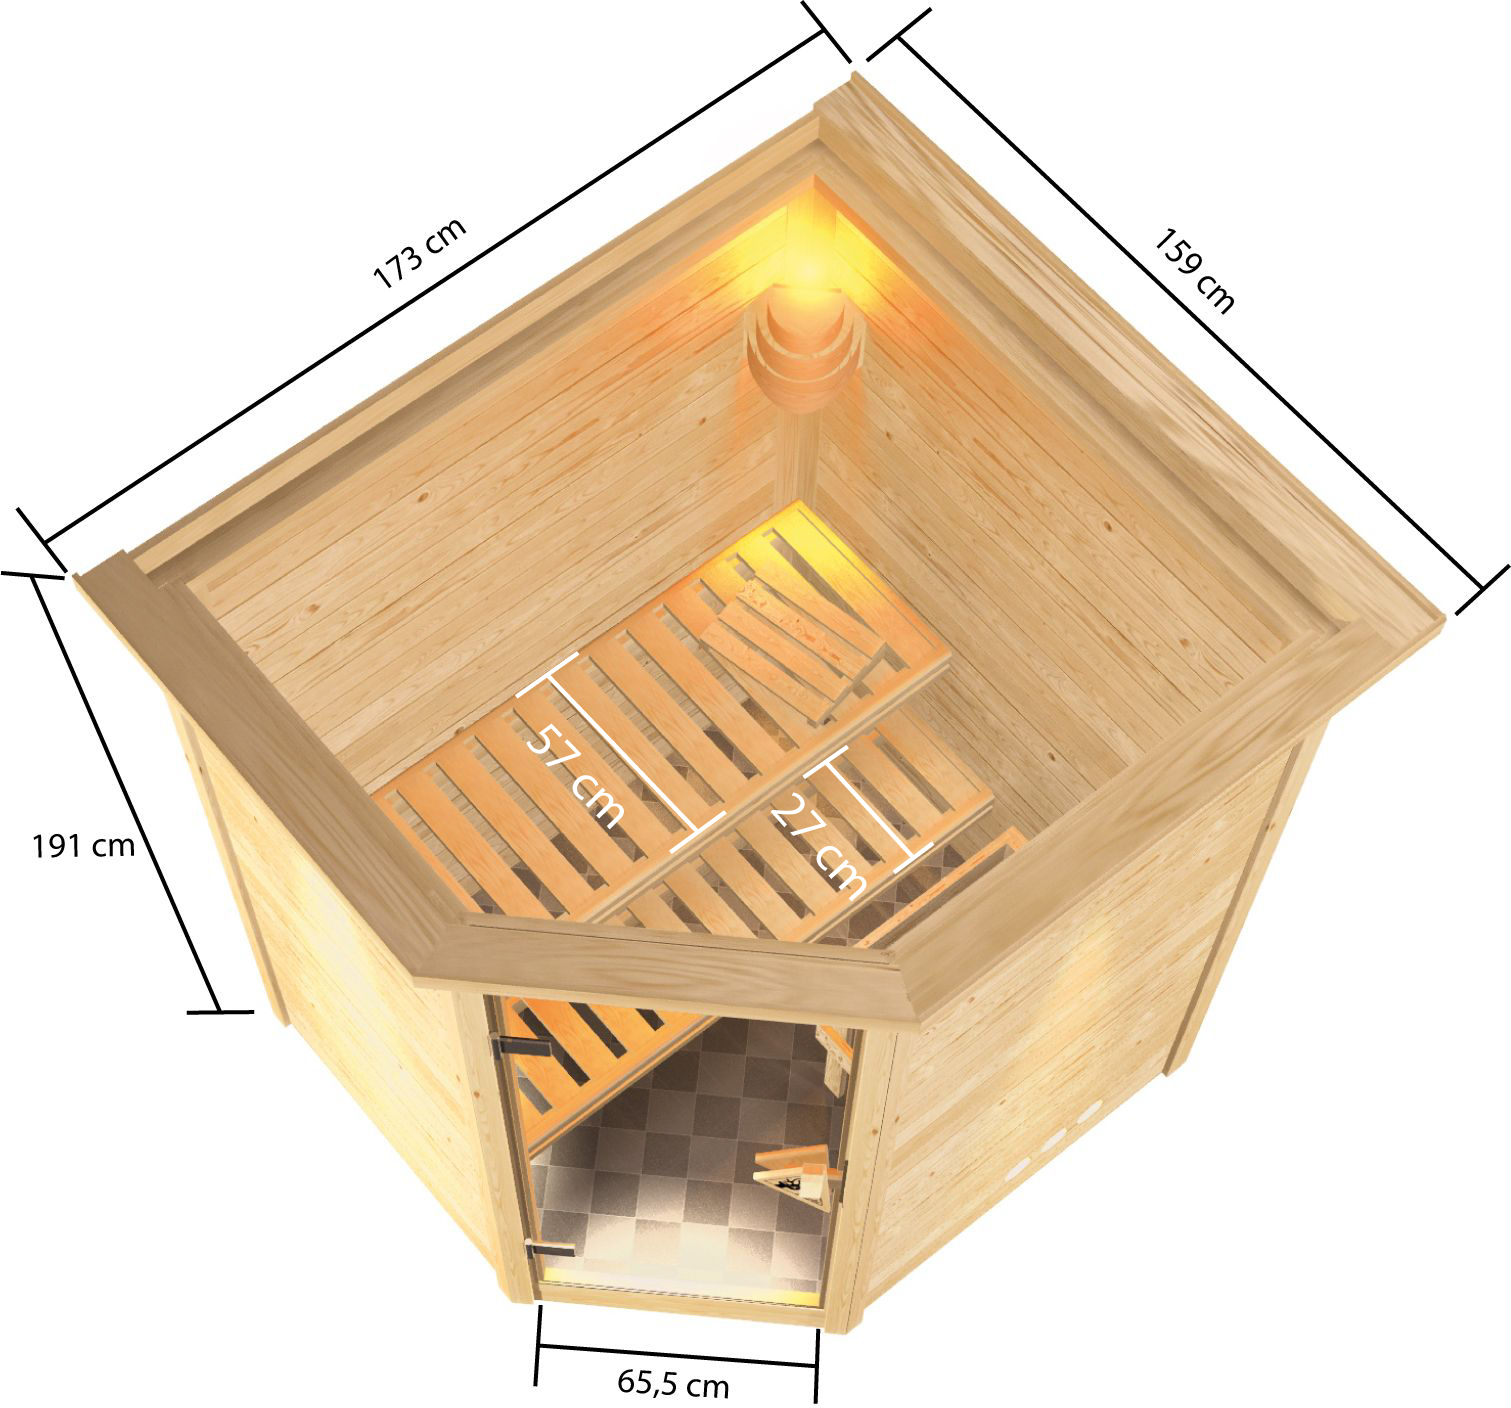 Woodfeeling Sauna Antonia 38mm Dachkranz Saunaofen 9 kW extern Bild 8